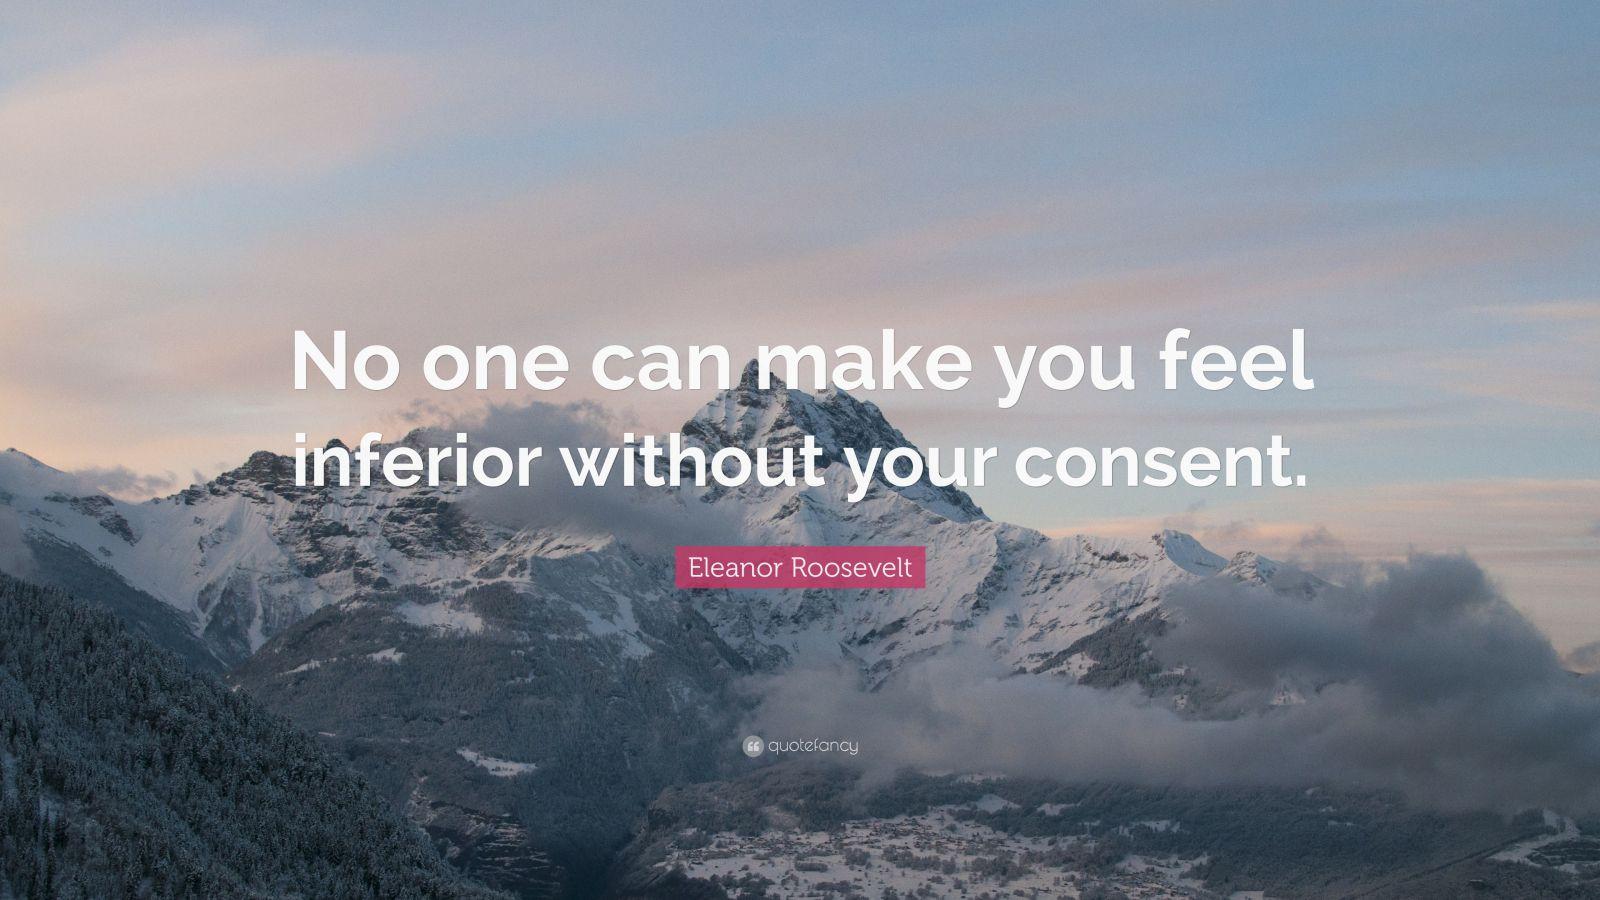 Eleanor Roosevelt Quote Wallpaper Consent Eleanor Roosevelt Quote No One Can Make You Feel